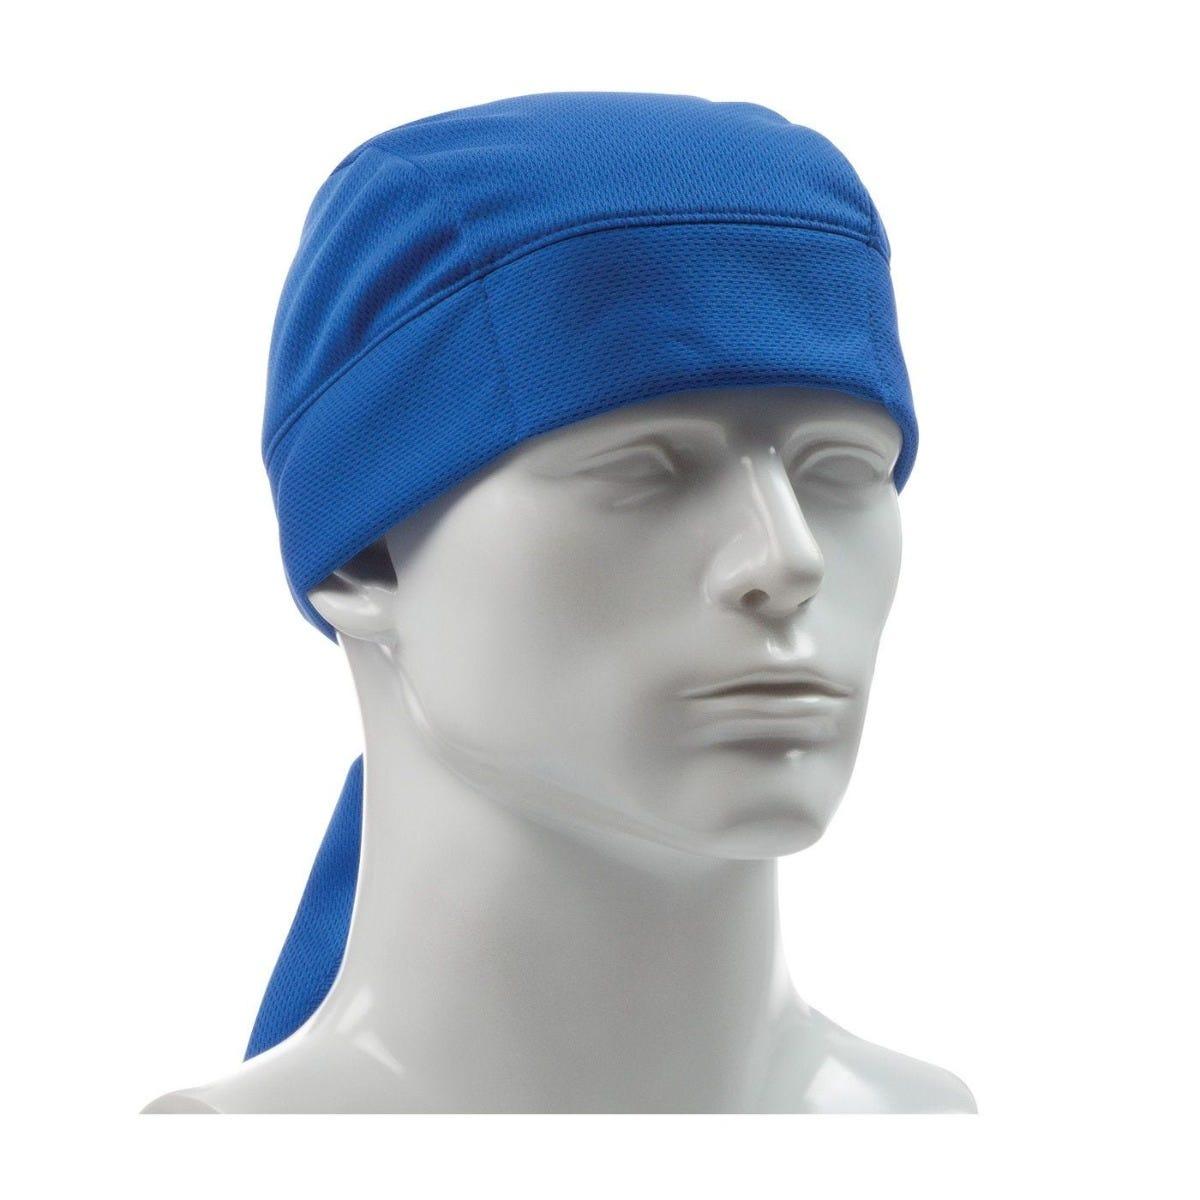 Cooling Towels, Bandanas, & Headbands